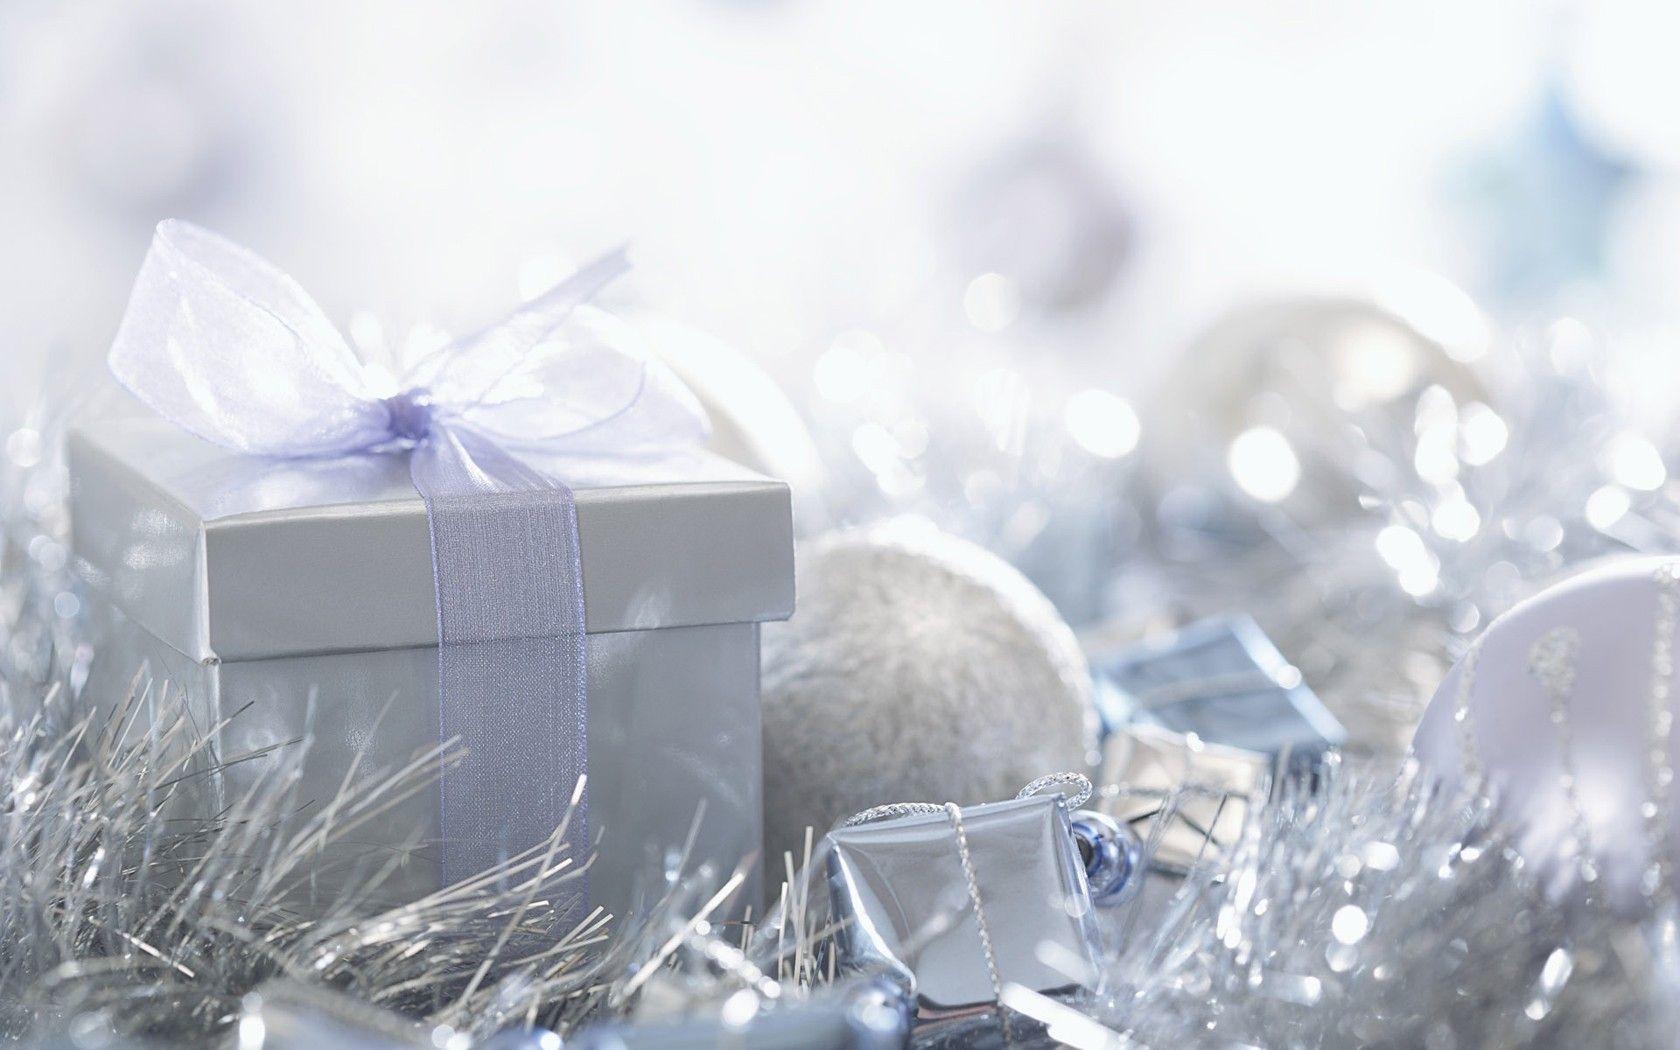 Xmas Stuff For White Christmas Backgrounds